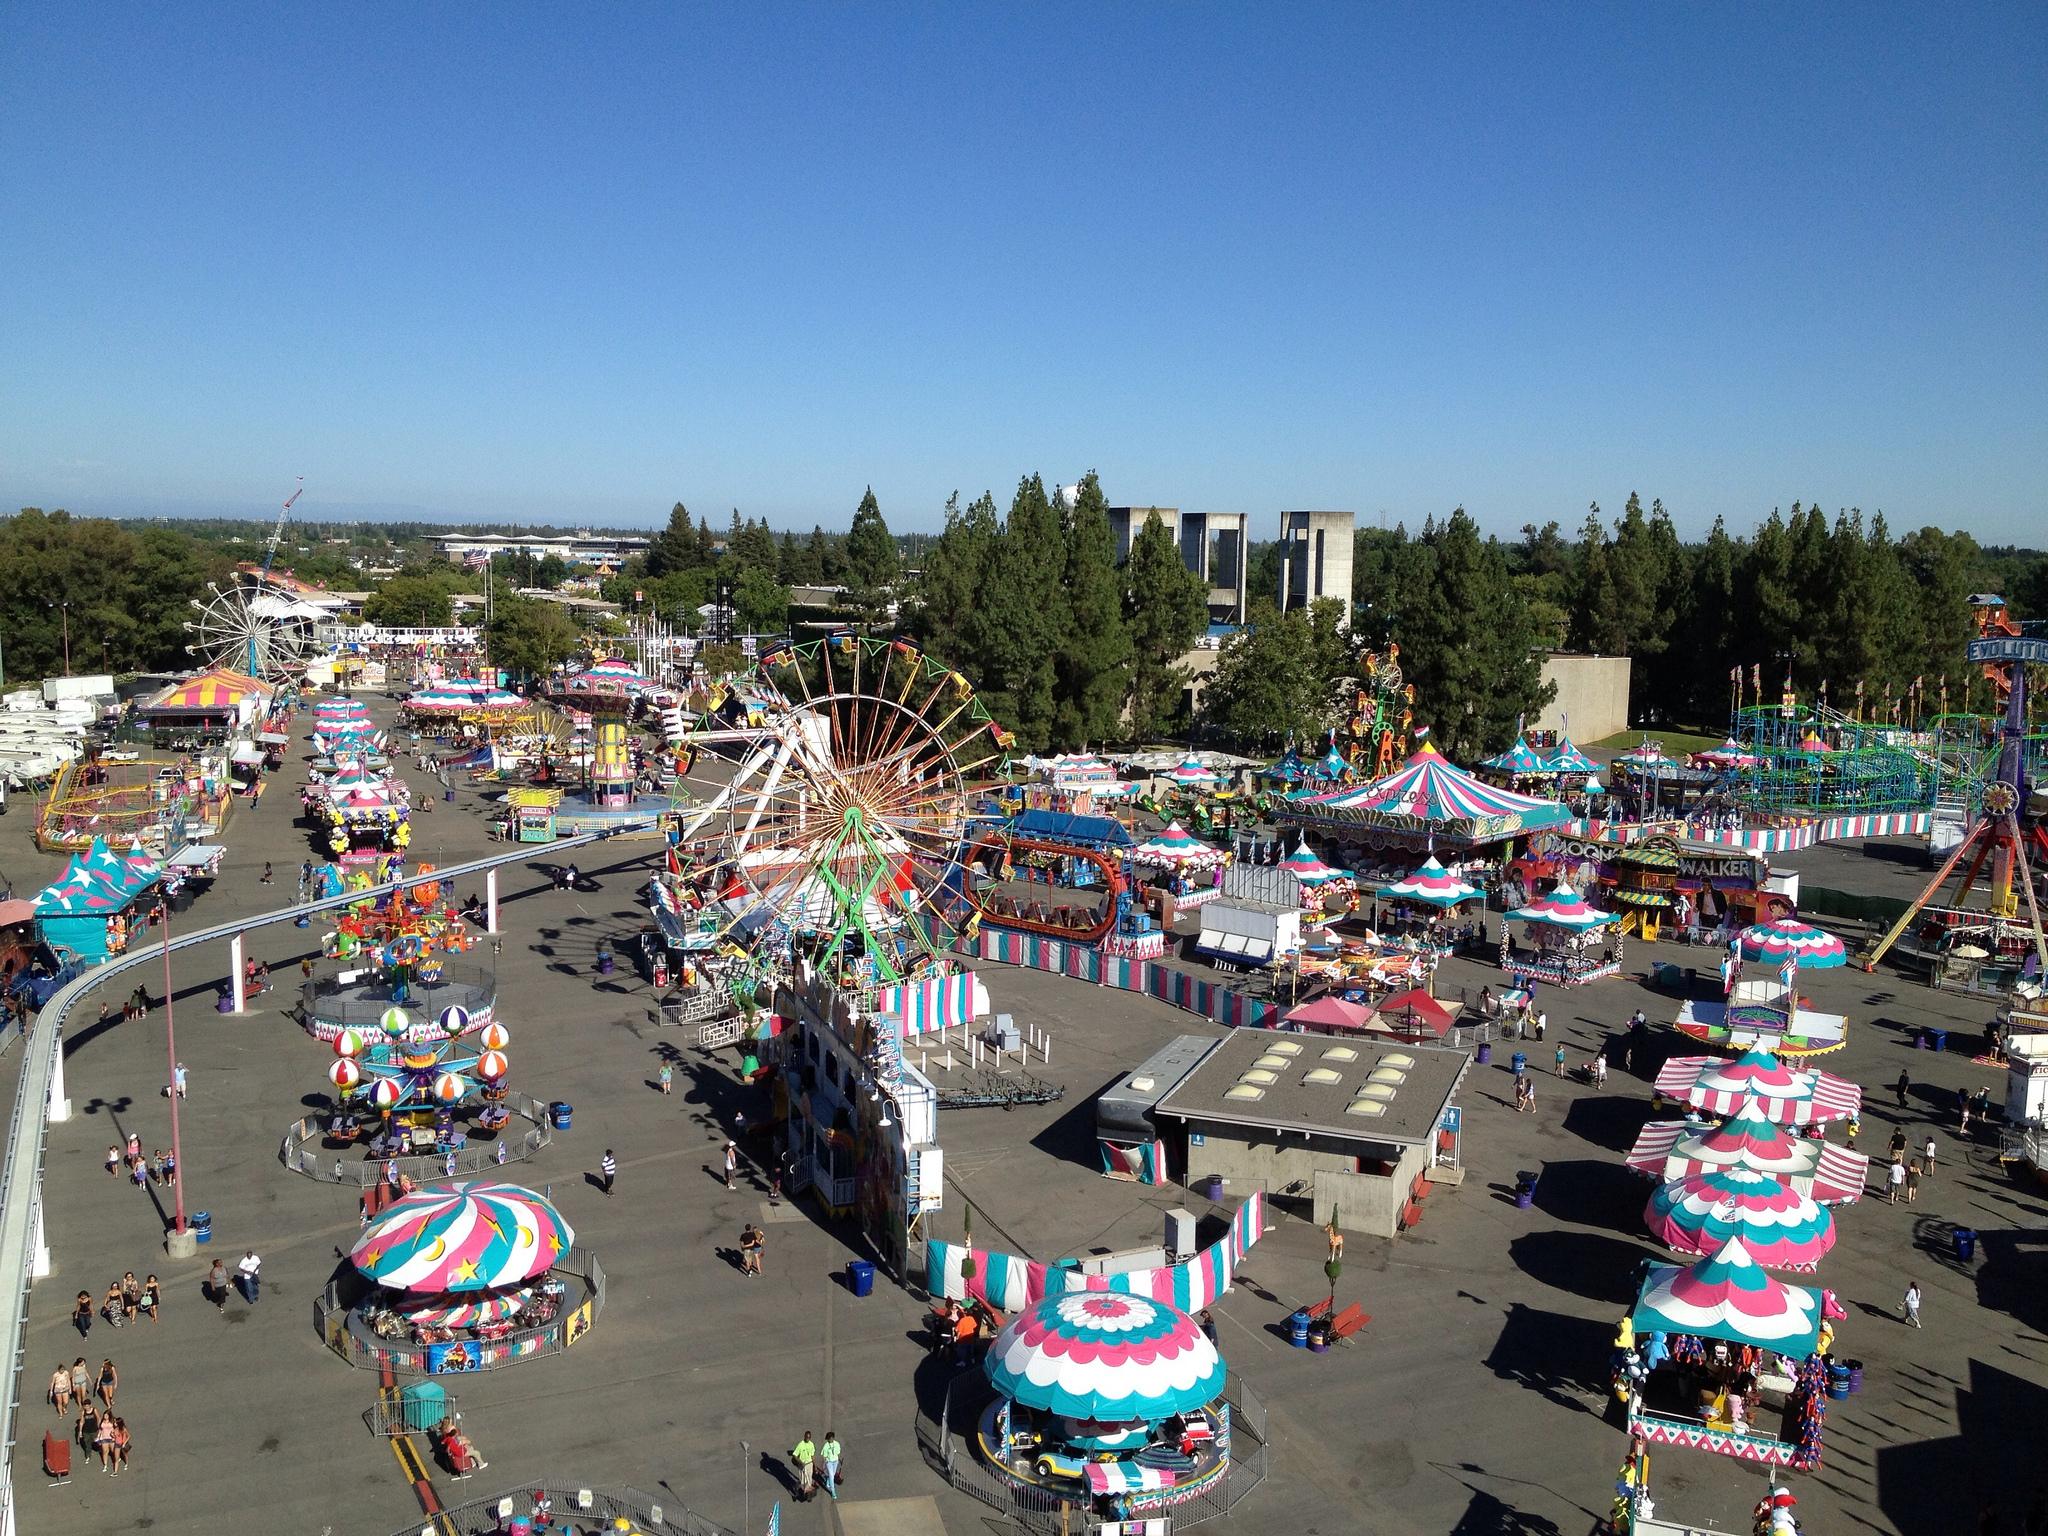 342/365 ~ California State Fair #sacramento, Ray Bouknight July 15, 2013